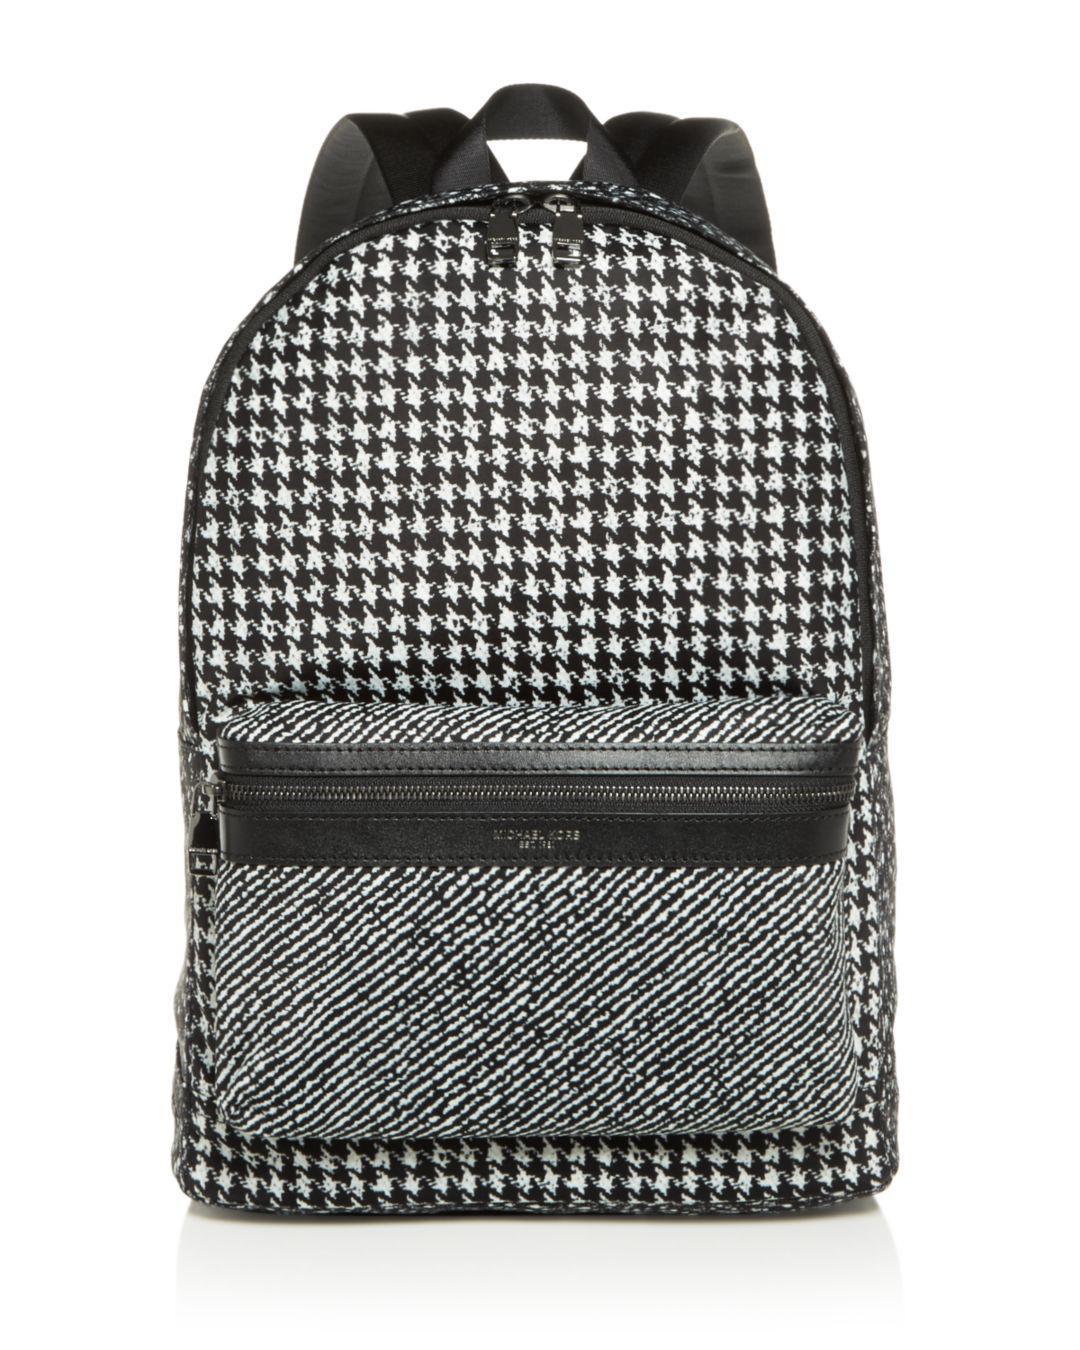 be63a99606 Lyst - Michael Kors Kent Houndstooth Nylon Backpack in Black for Men ...